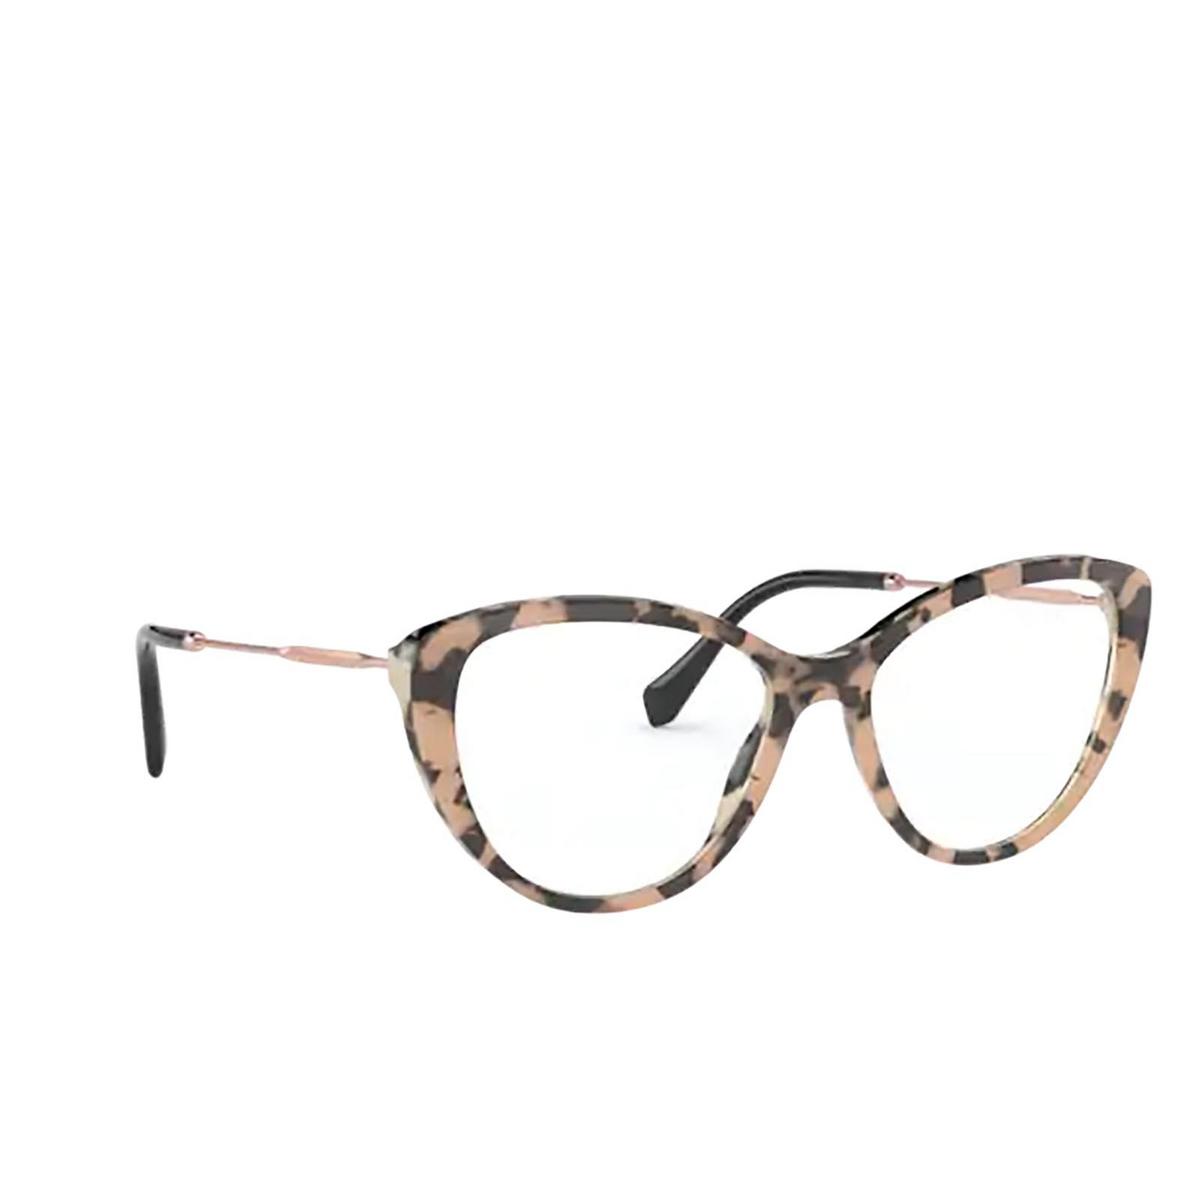 Miu Miu® Cat-eye Eyeglasses: MU 02SV color Havana 07D1O1 - three-quarters view.